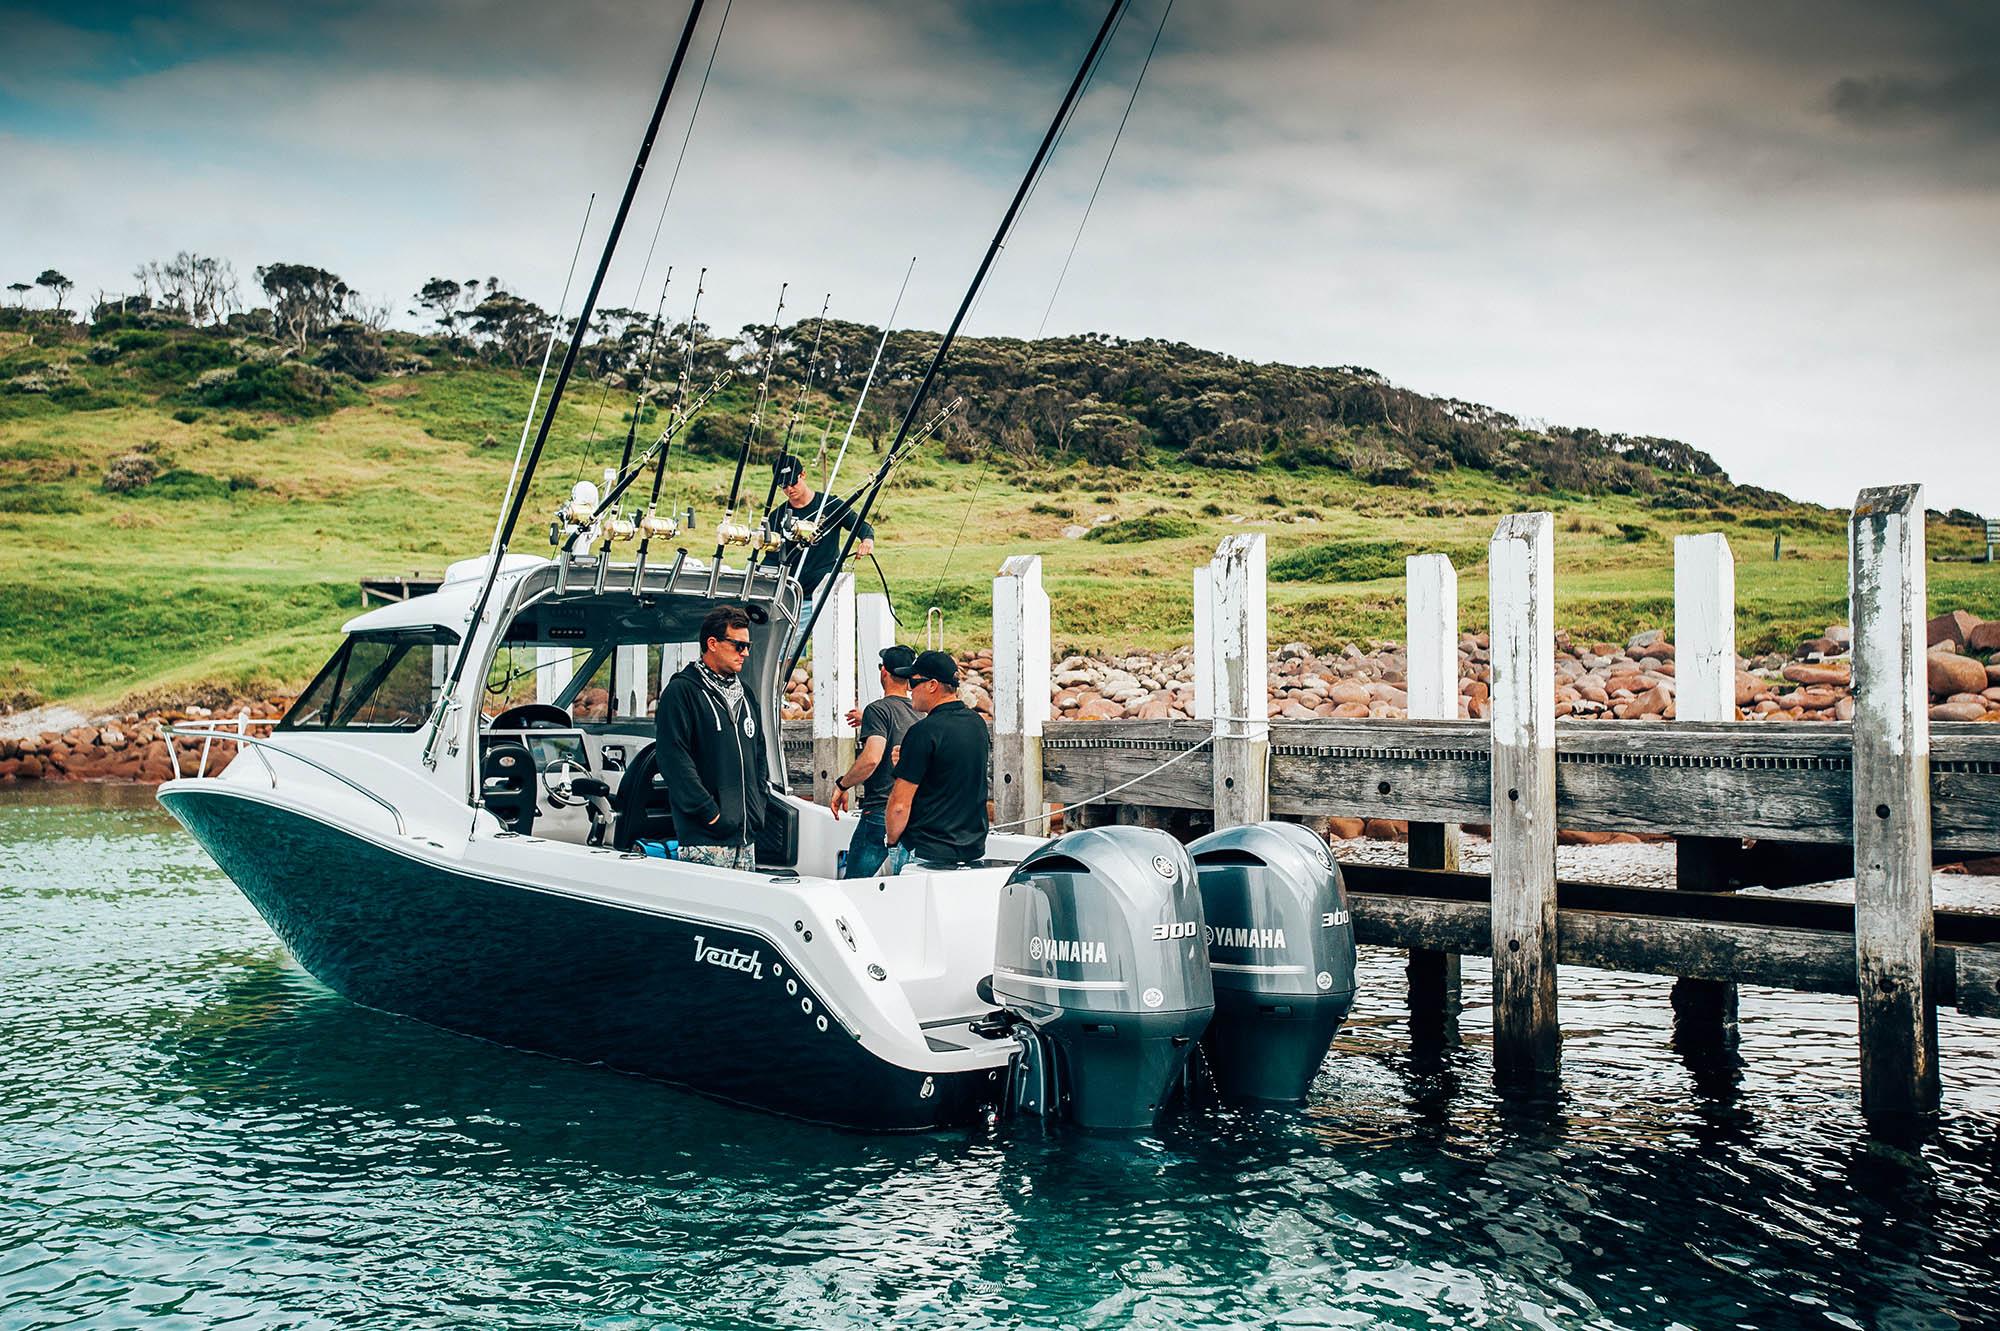 veitch-boat-27-9